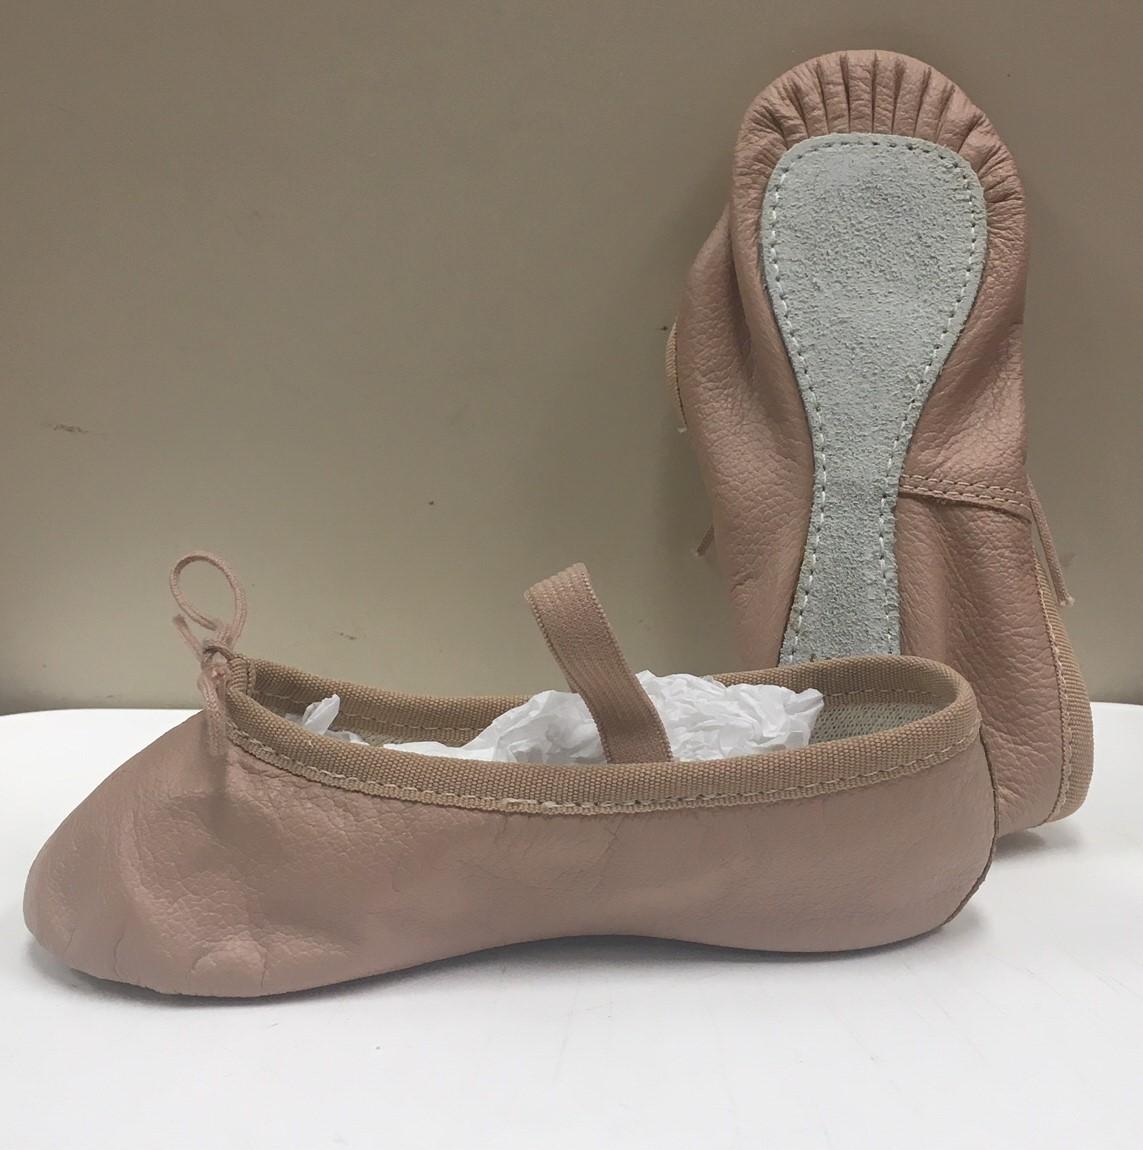 Capezio Toddler's Teknik II Full Sole Leather Ballet Shoes